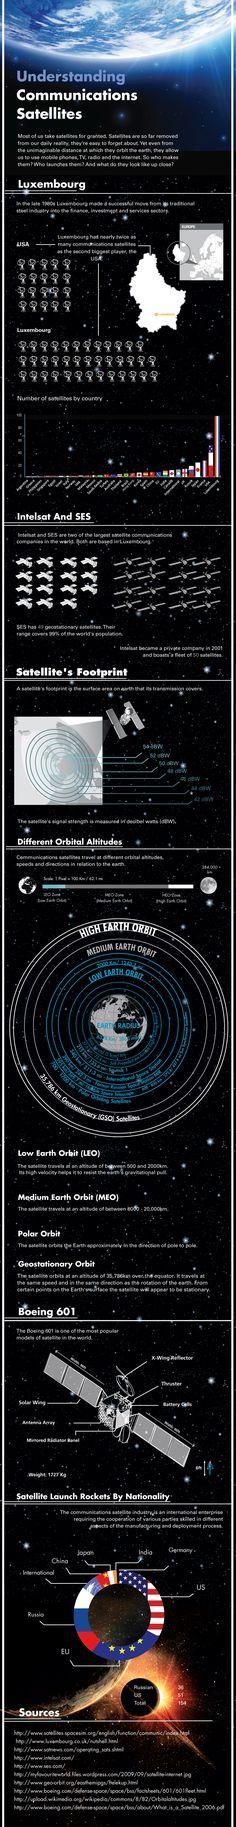 Understanding Communications Satellites